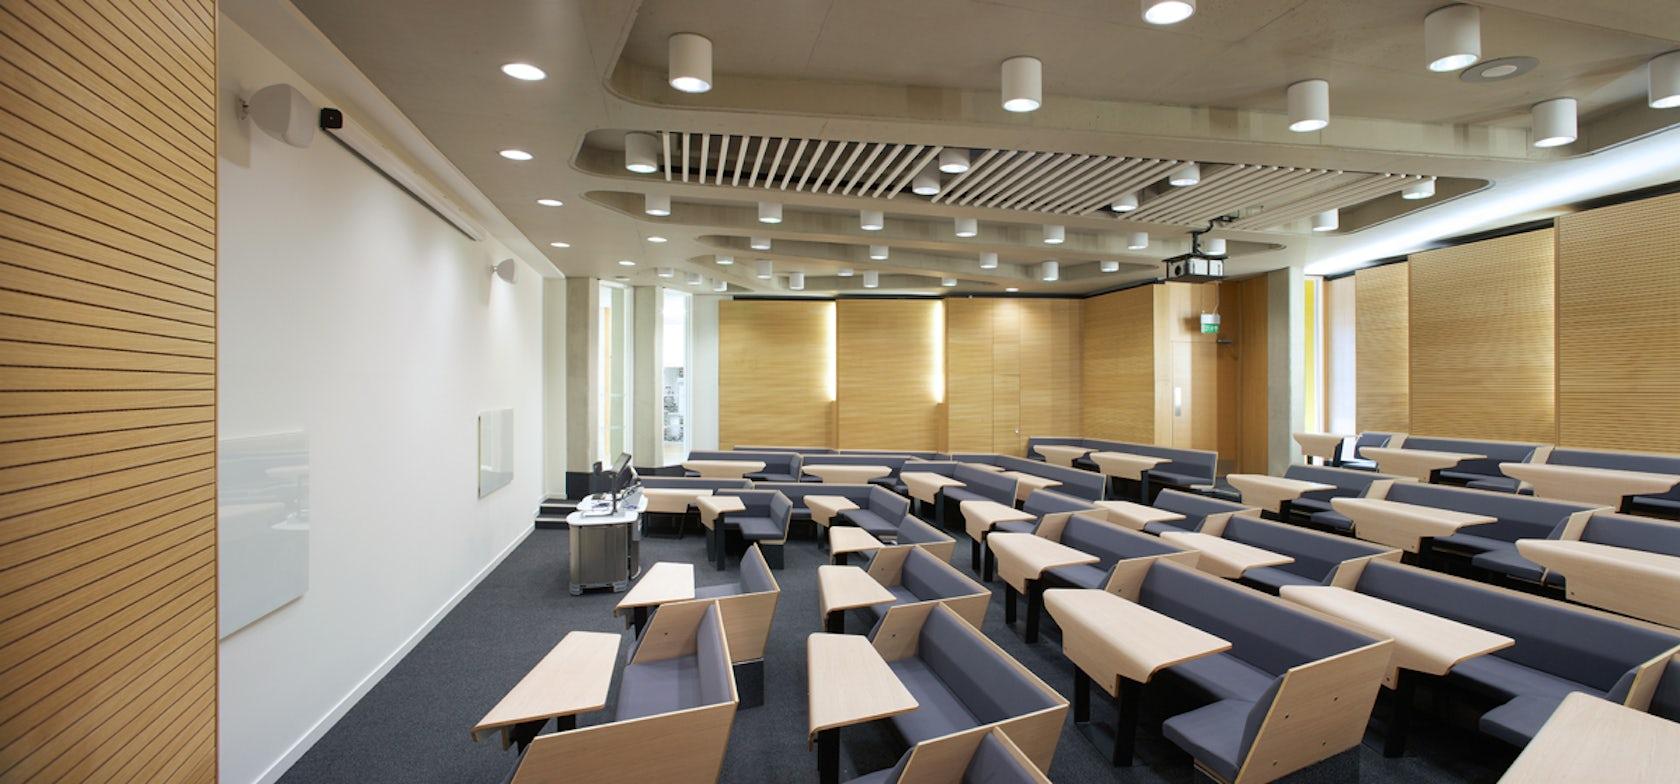 Loughborough design school loughborough university - How many years is interior design school ...